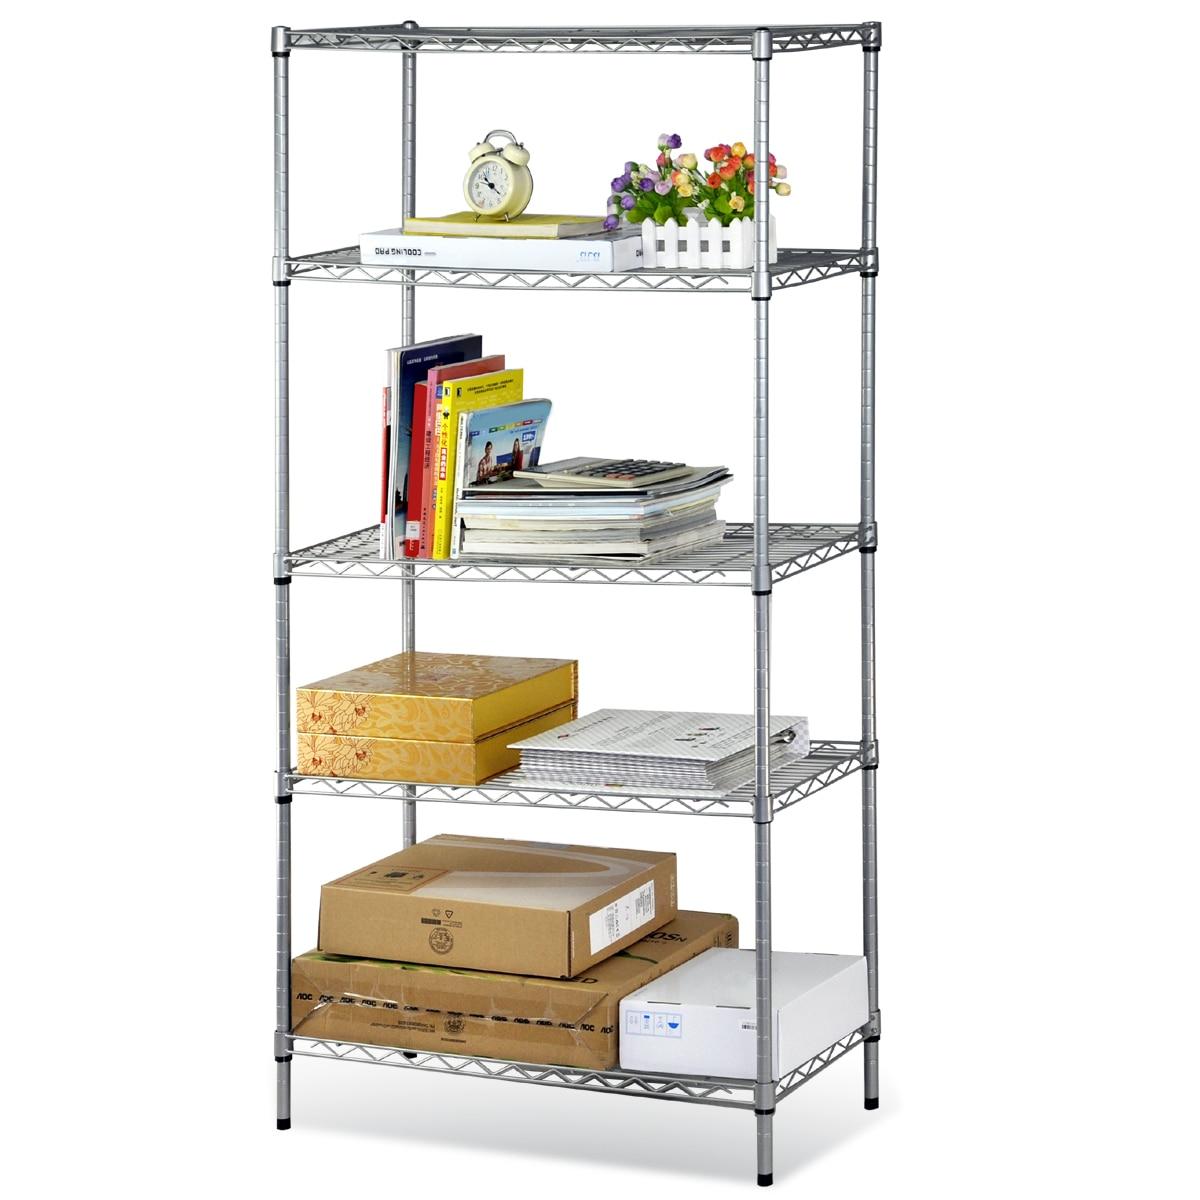 DSHA New Hot 5-Tier Stainless Steel Chrome Kitchen Storage Shelves New<br><br>Aliexpress